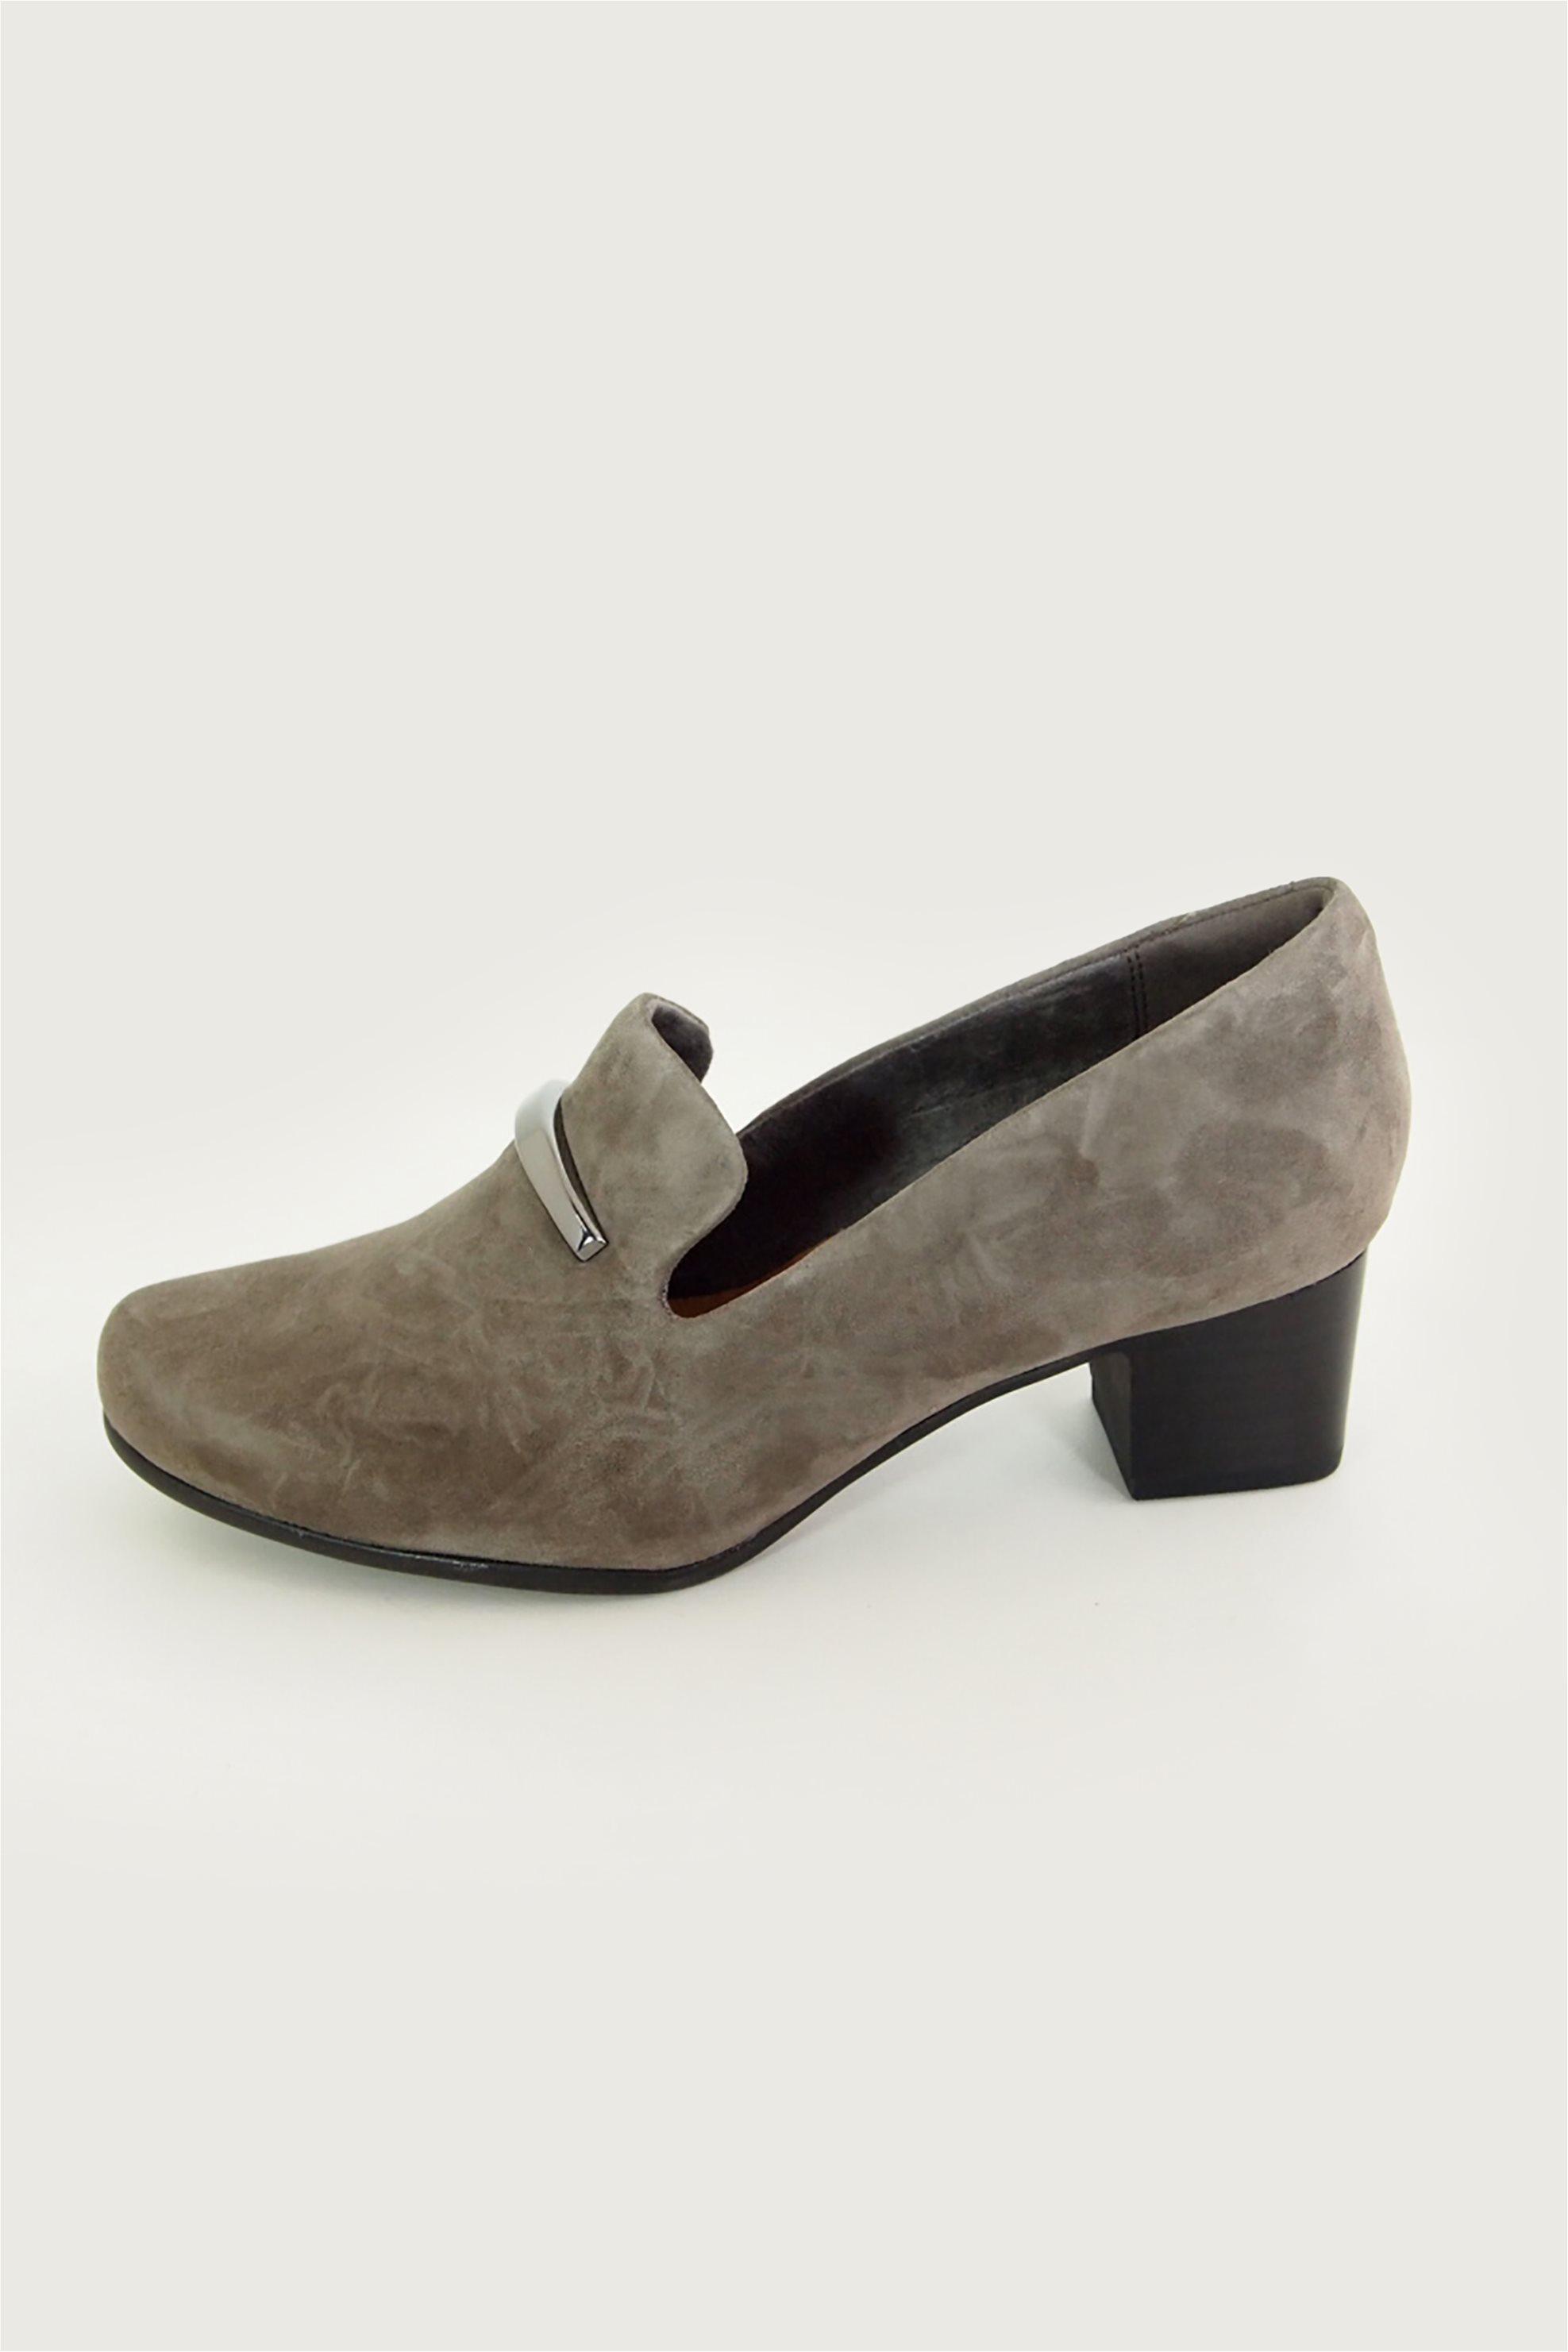 Clarks γυναικεία παπούτσια slip-on με τακούνι «Un Damson Lane» – 26144601 – Μπεζ